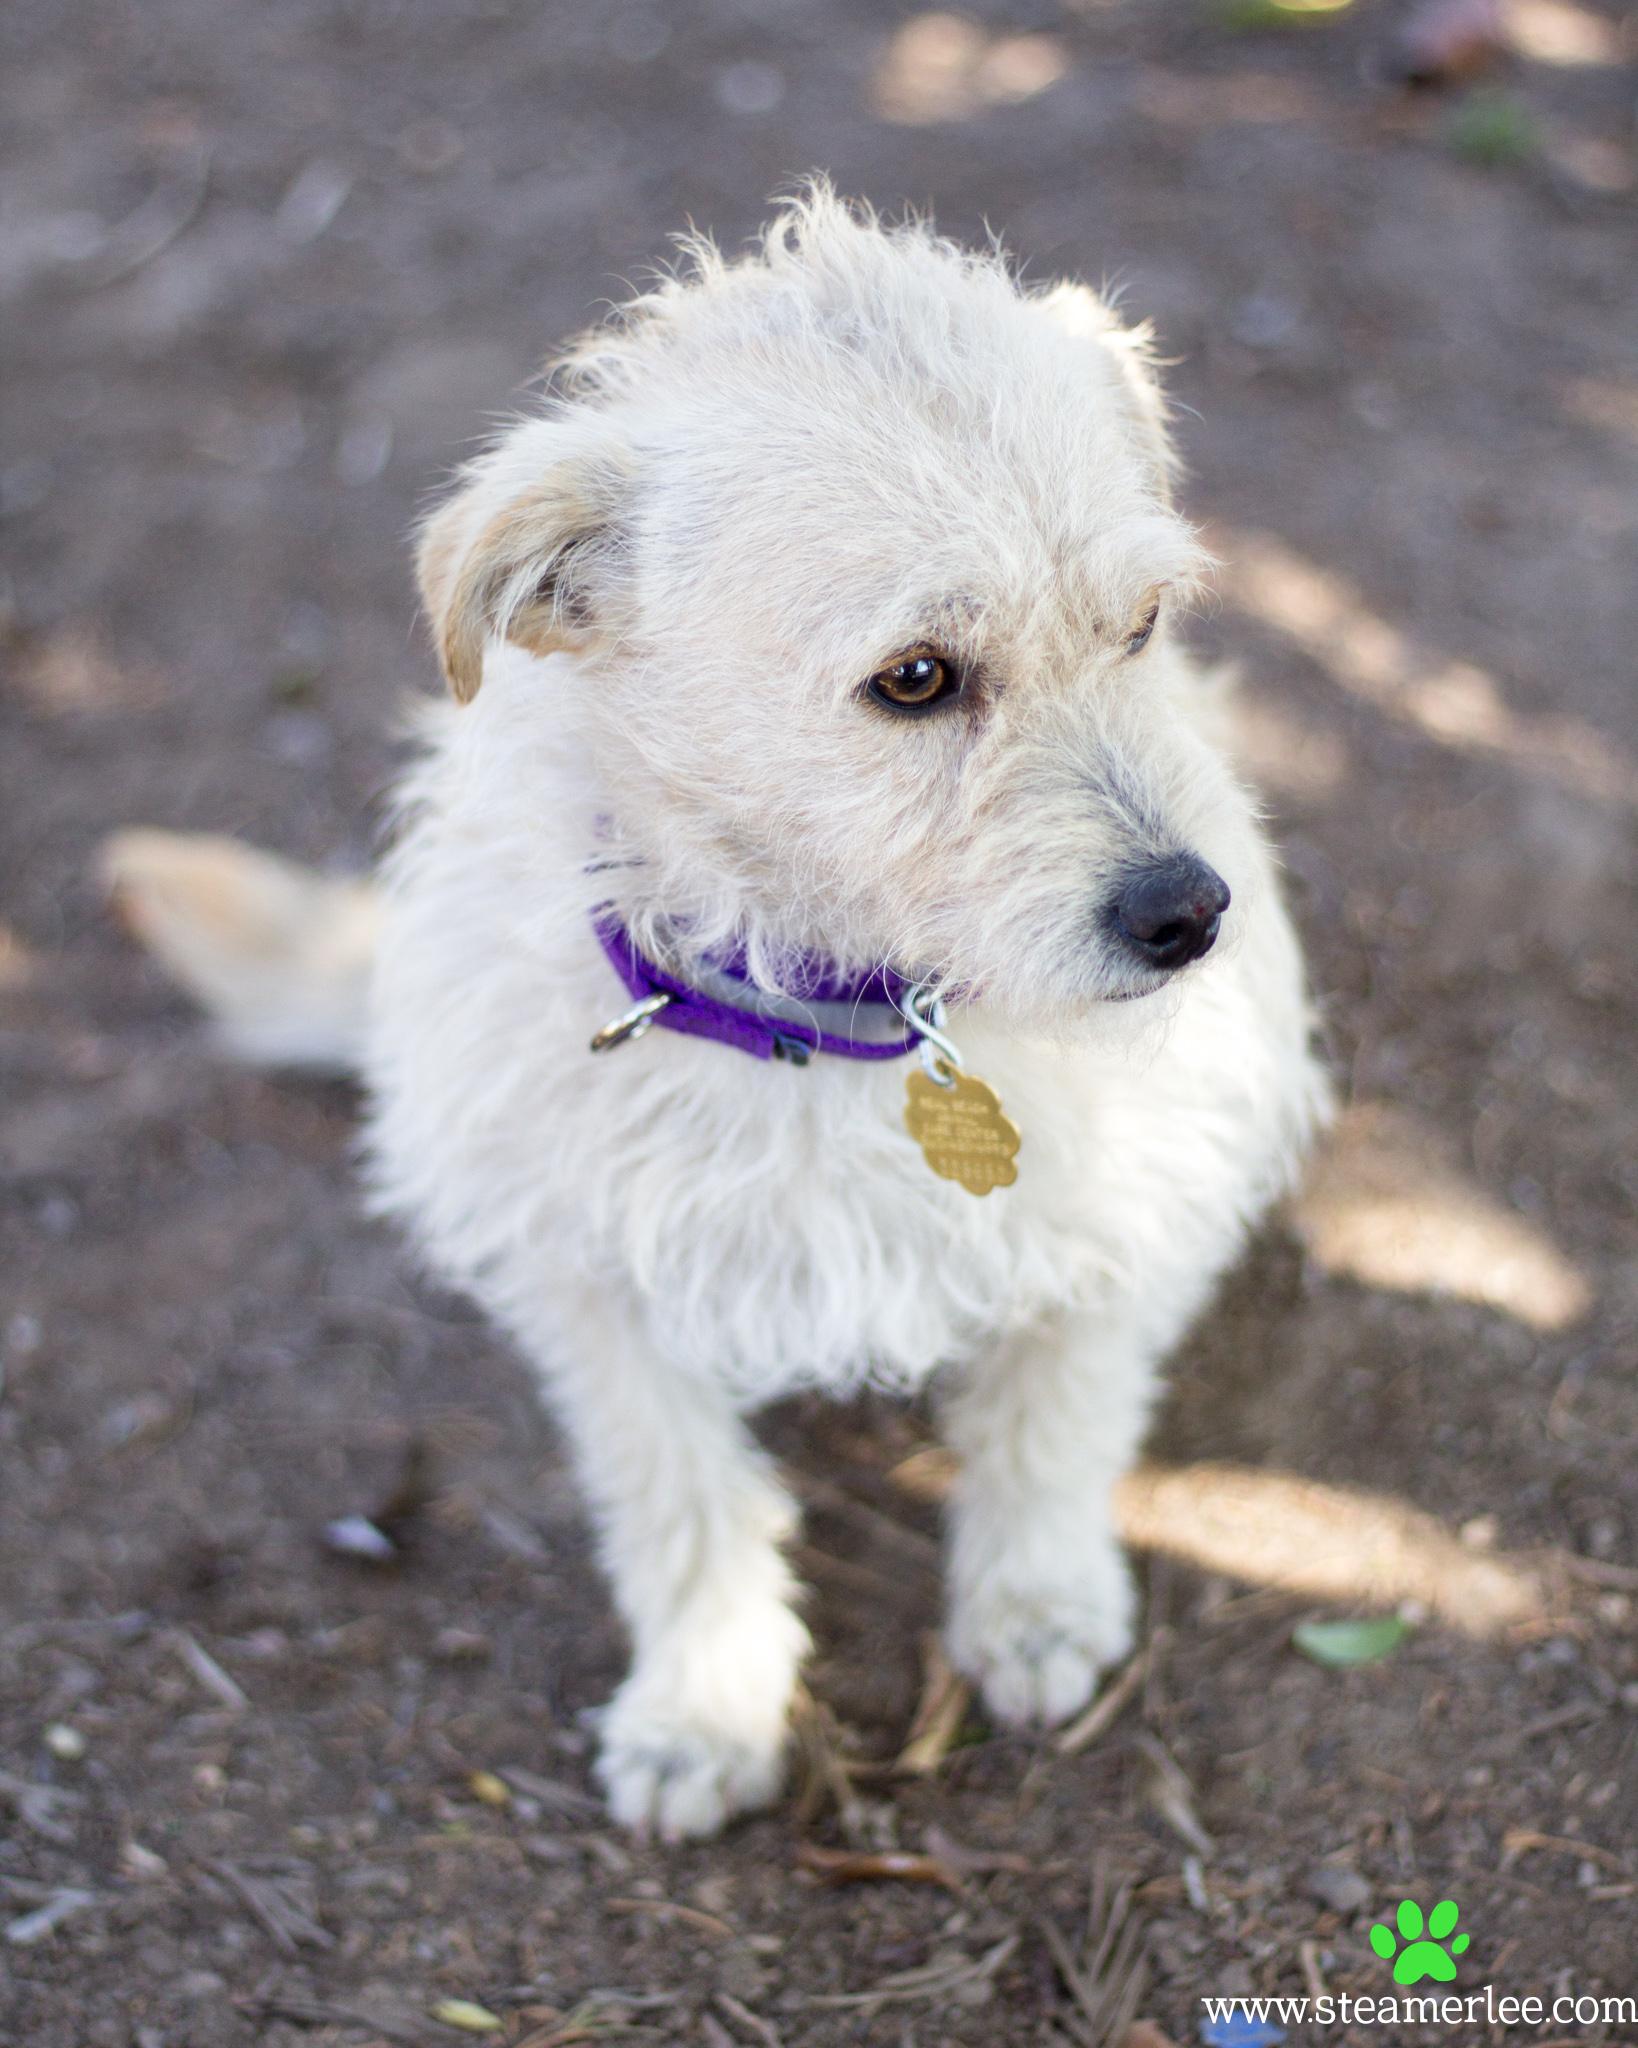 252-Orange-County-Dog-Photography-Steamer-Lee-Southern-California-SBACC.JPG